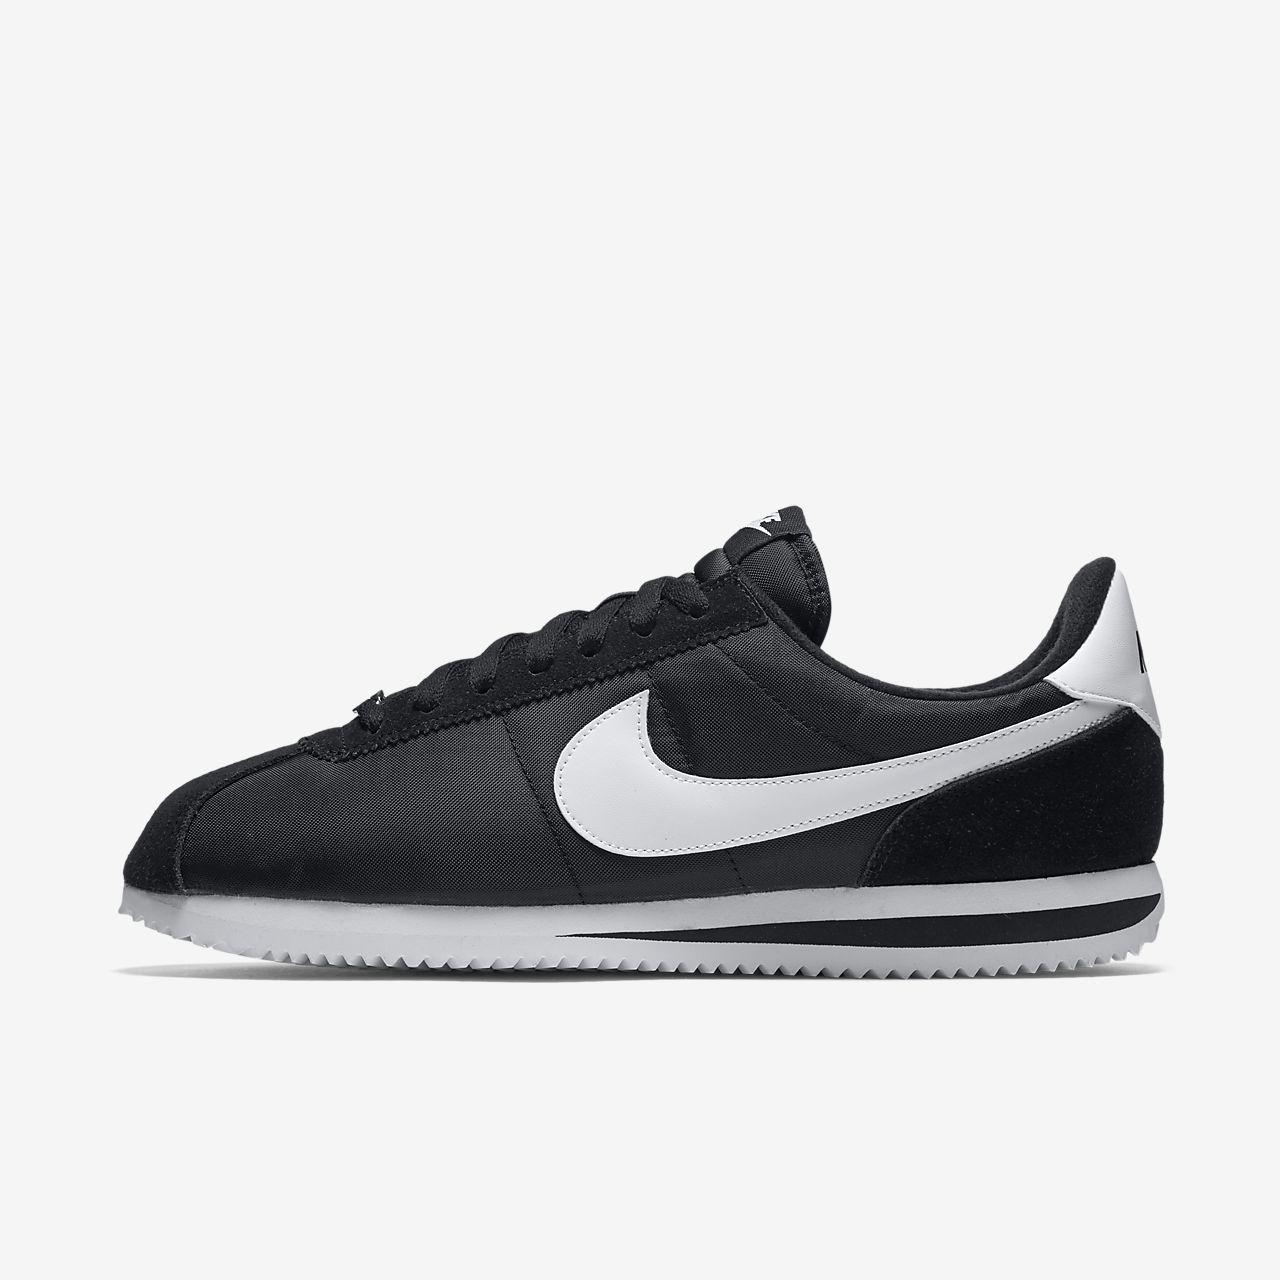 Nike Cortez Basic Nylon Boys Girls Trainer Black Gold White 4 5 RRP £50//